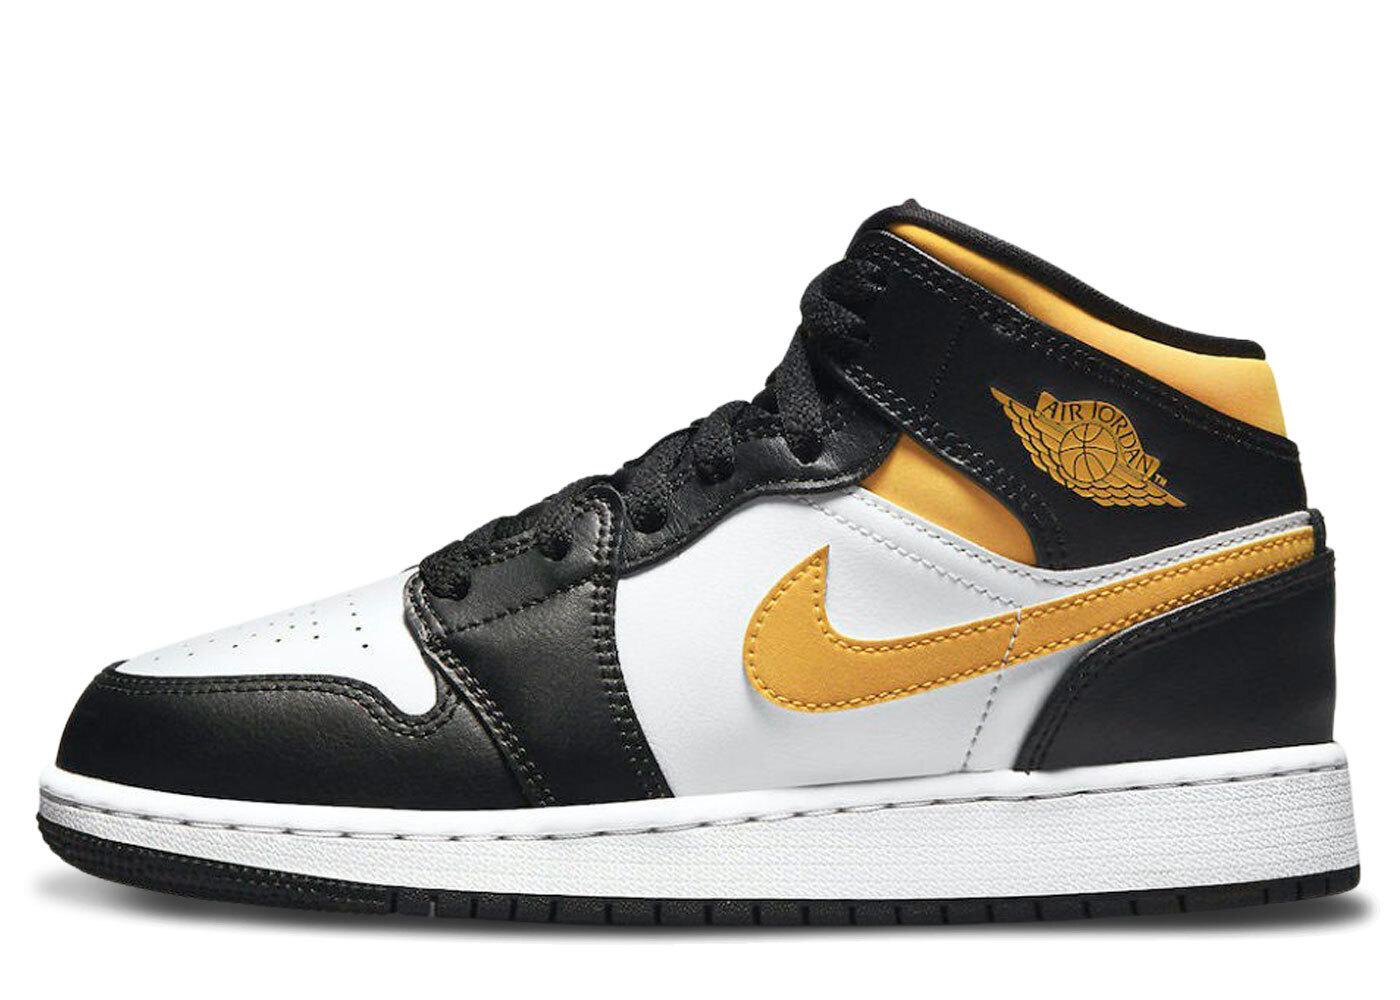 Nike Air Jordan 1 Mid University Gold GS/Blackの写真